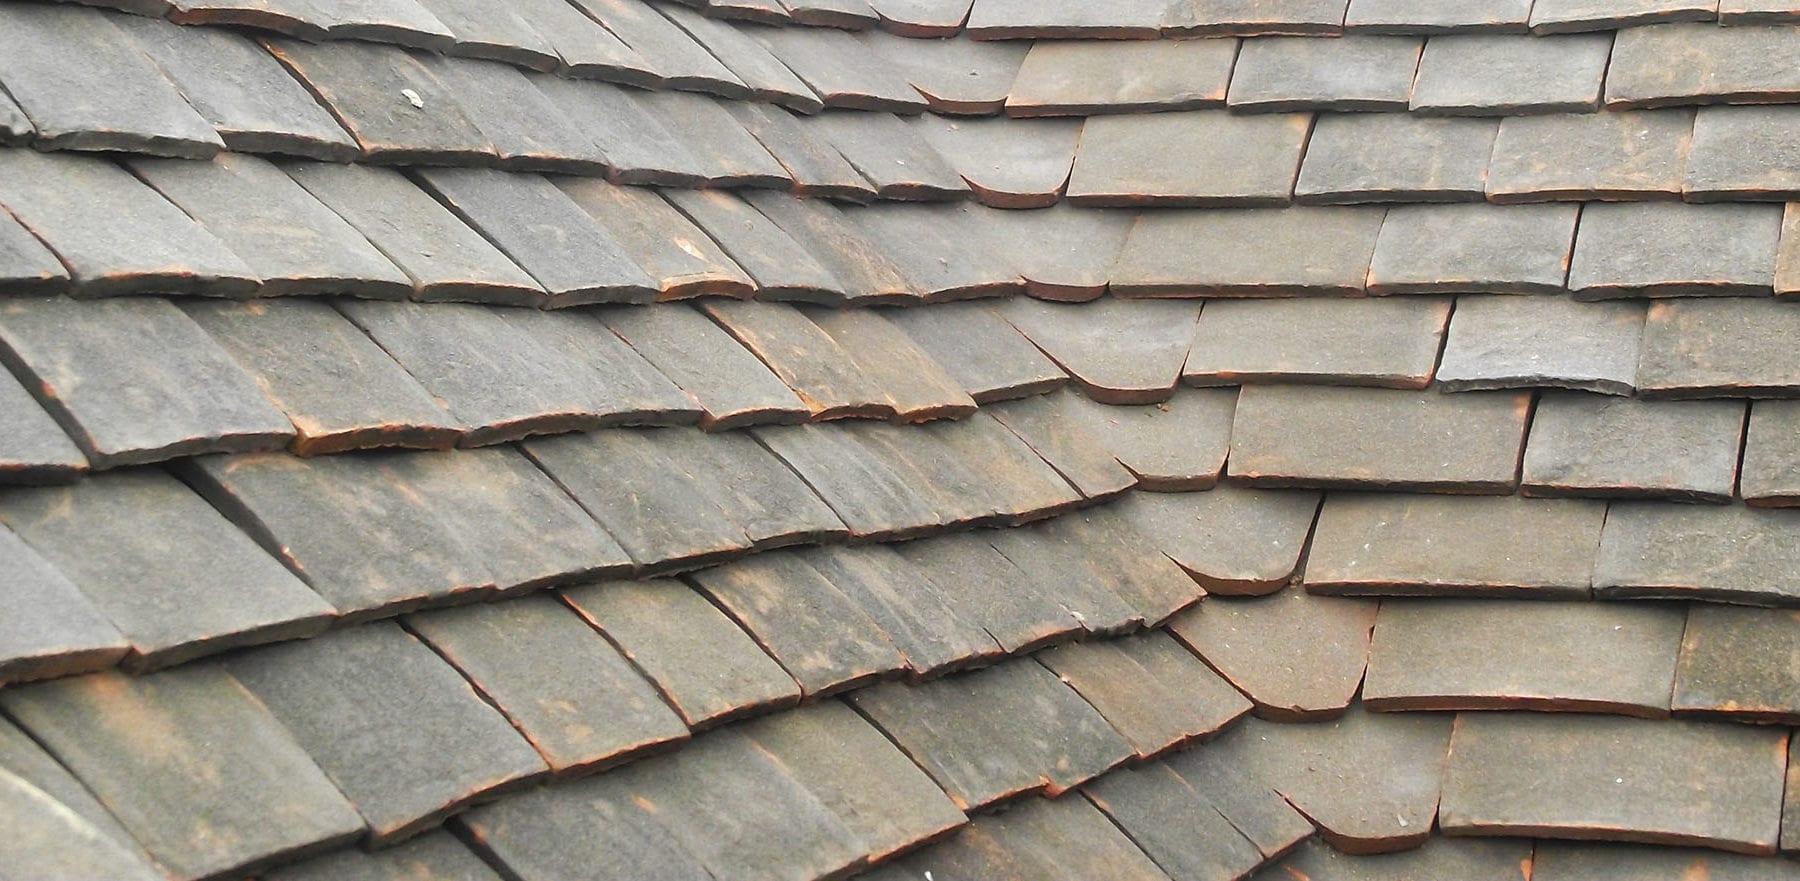 Lifestiles - Handmade Restoration Clay Roof Tiles - Brighton, England 3